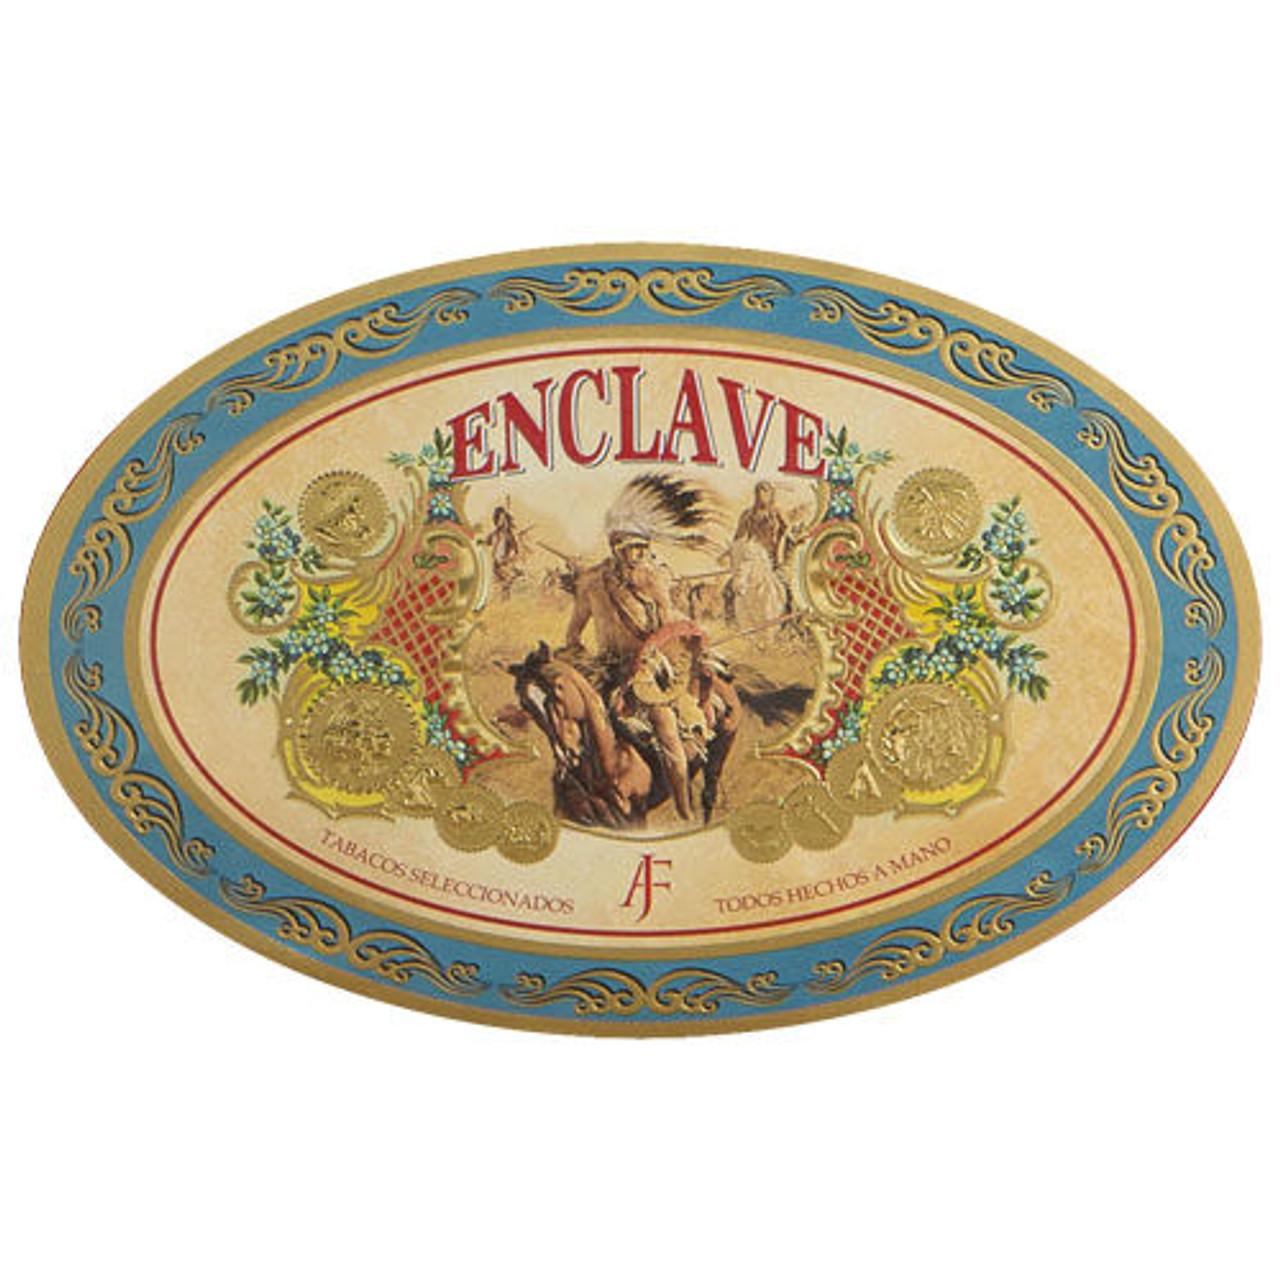 AJ Fernandez Enclave Figurado - 6 1/2 x 52 Cigars